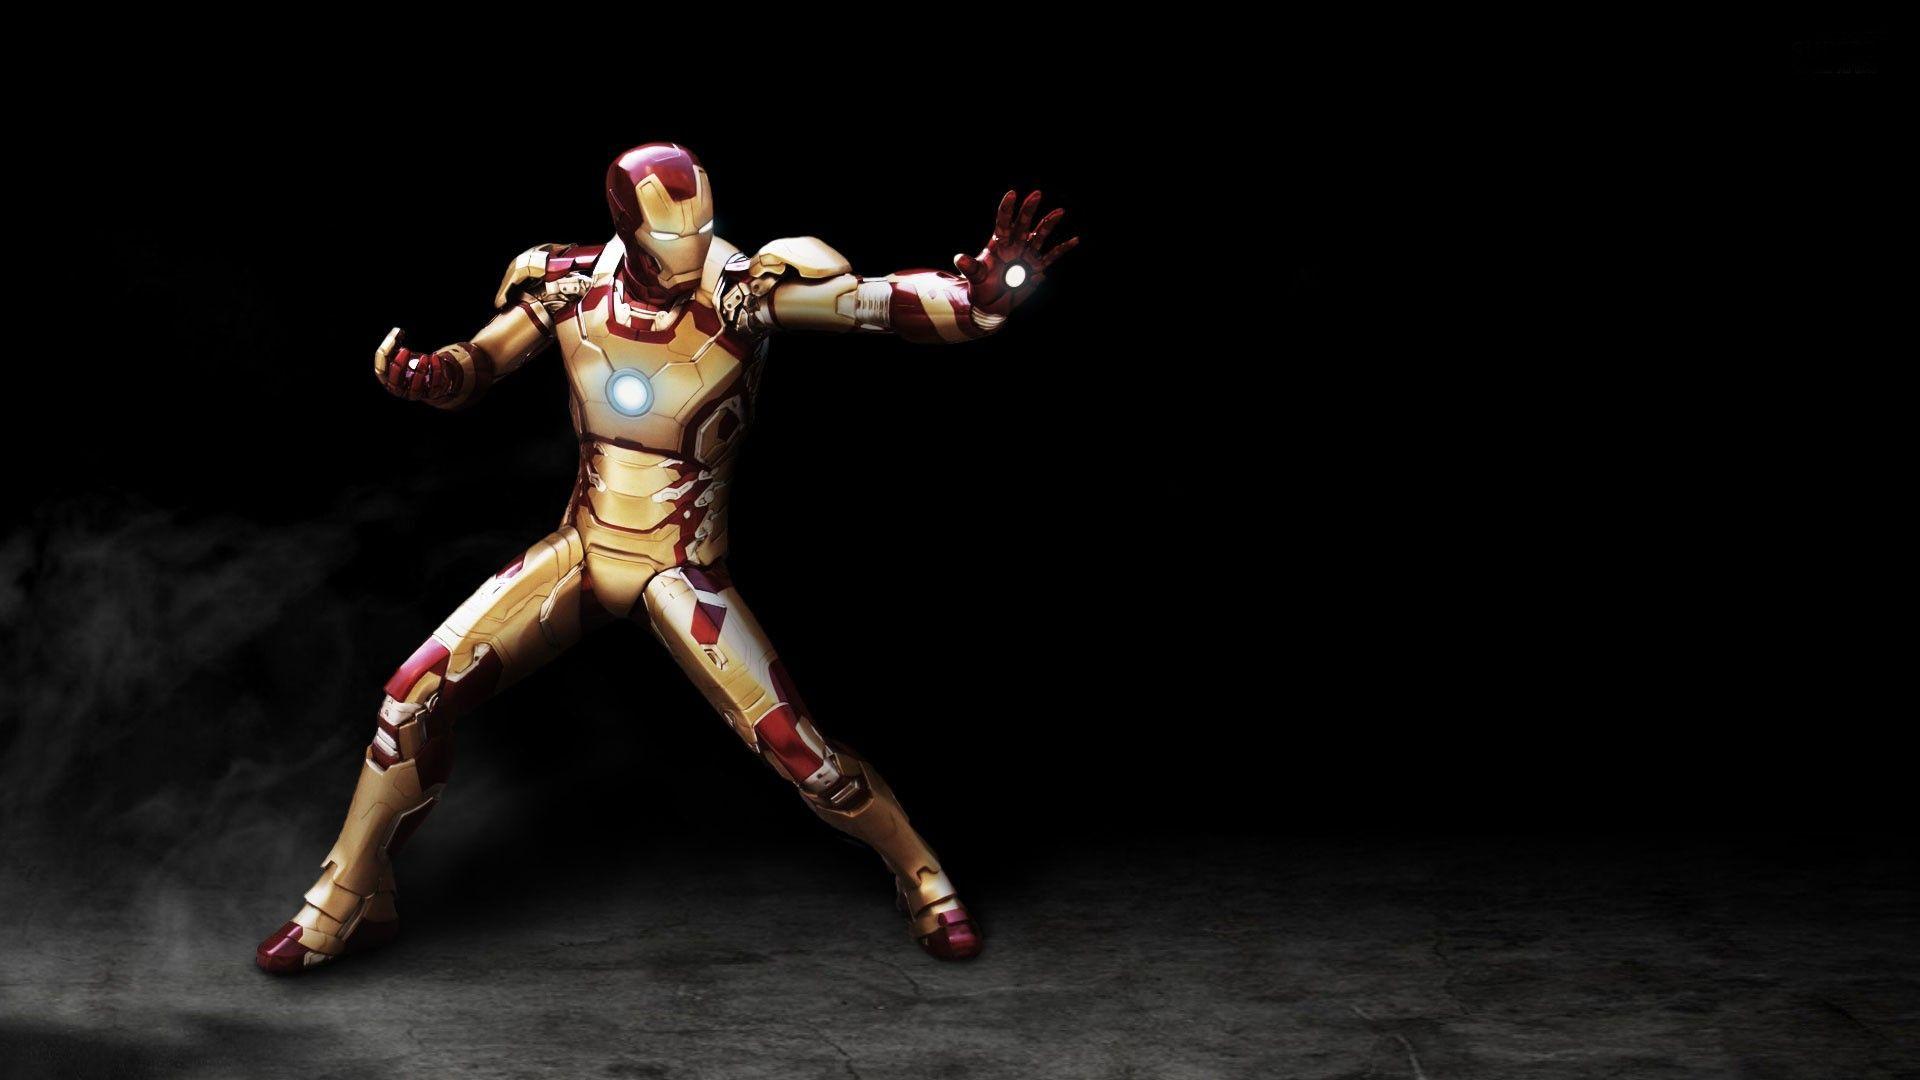 Iron Man Iron Man 3 Mark 42 Wallpaper 1920x1080 194256 Images